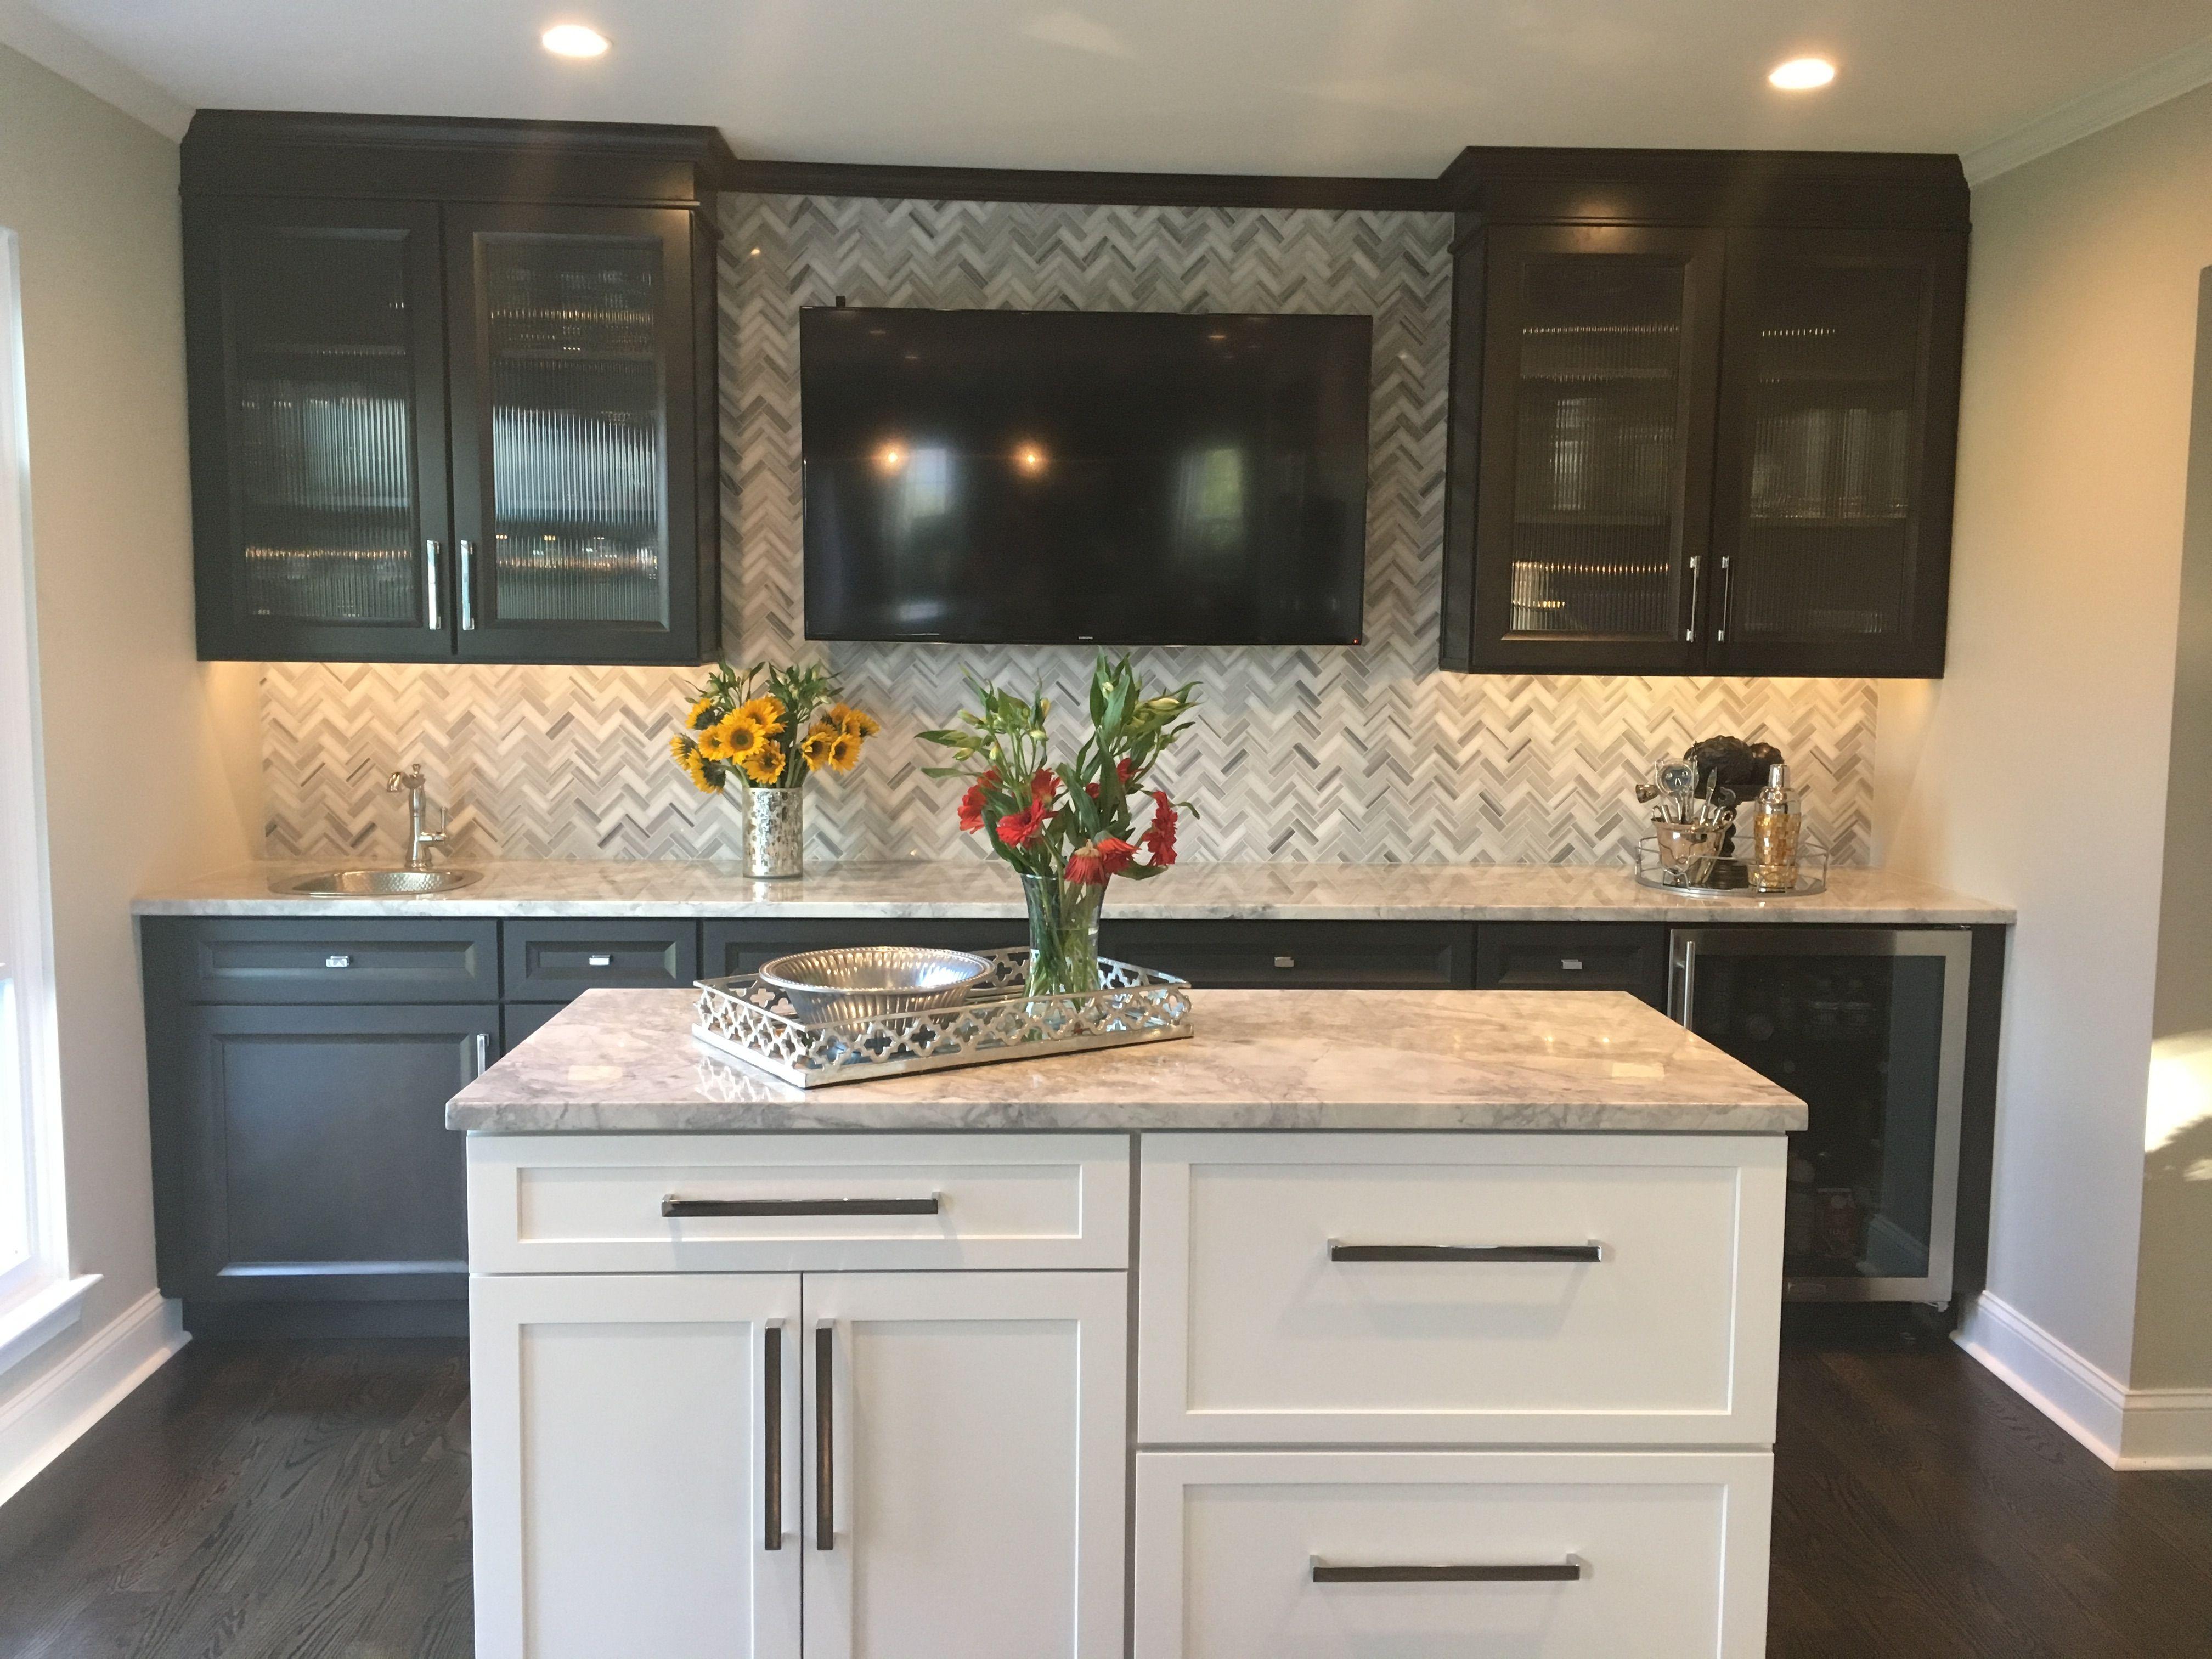 Merveilleux Wet Bar With Dark Cabinets, Gray And White Herringbone Backsplash And Super  White Quartz Countertops